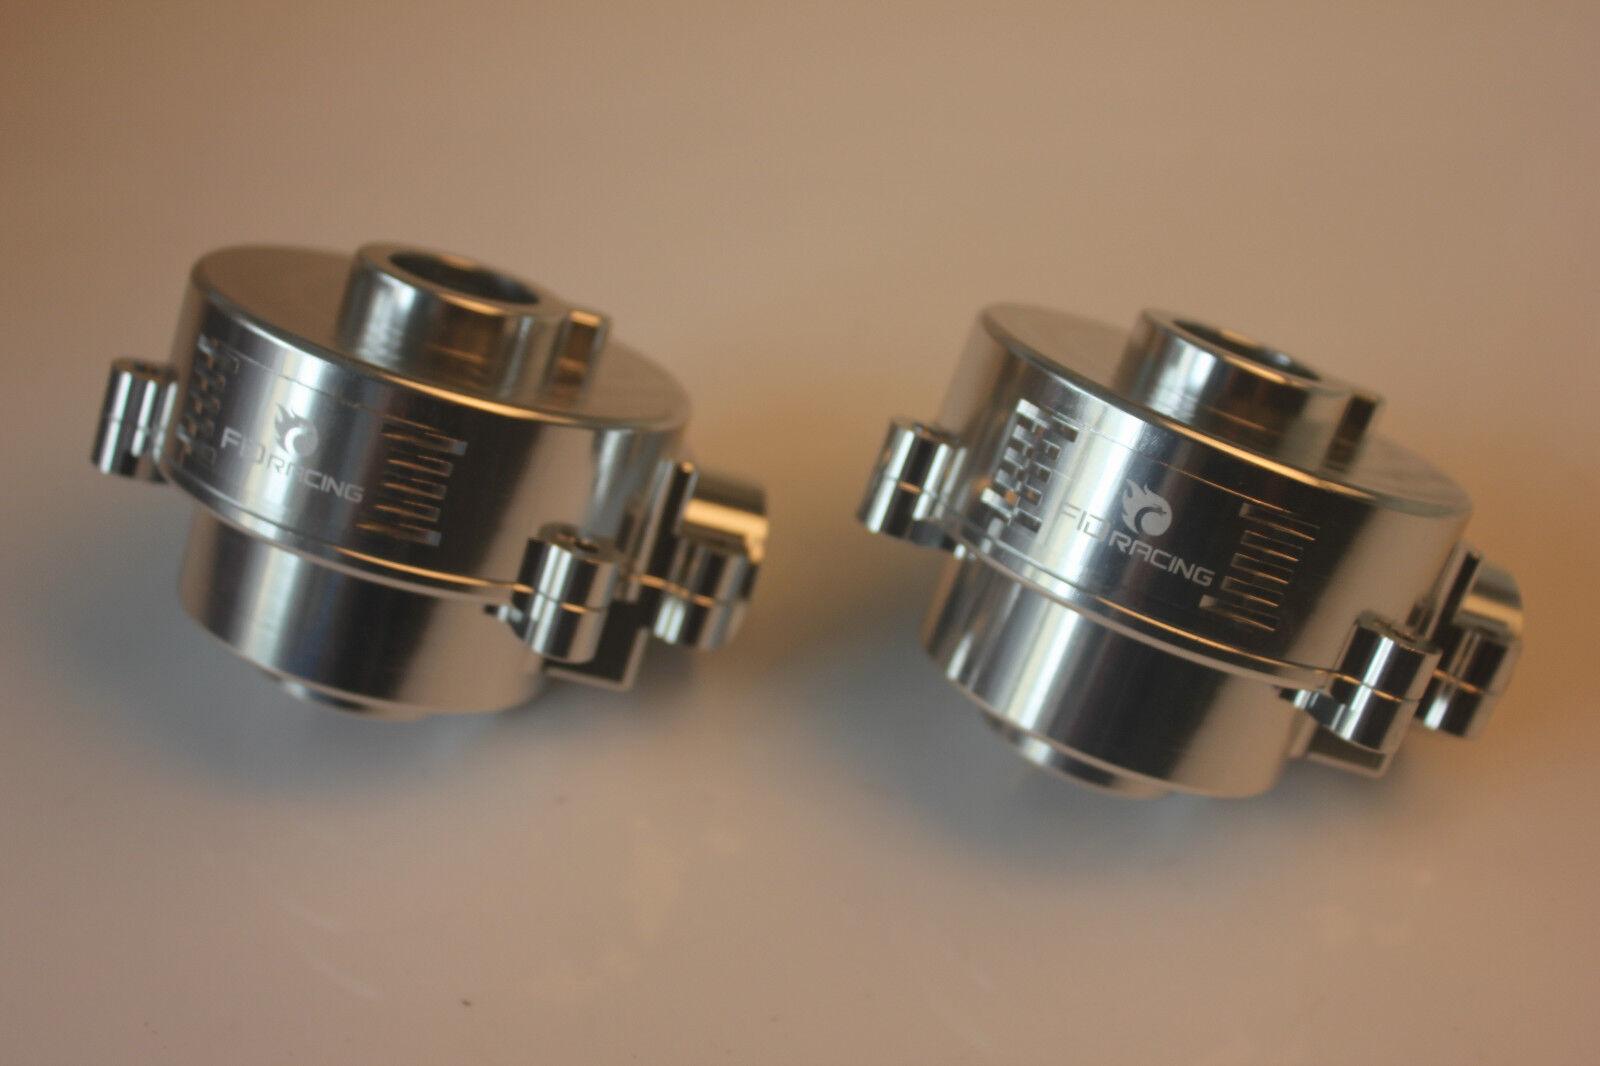 FID CNC aleación diff gear box geabox para Losi DBXL DBXL-e mtxl